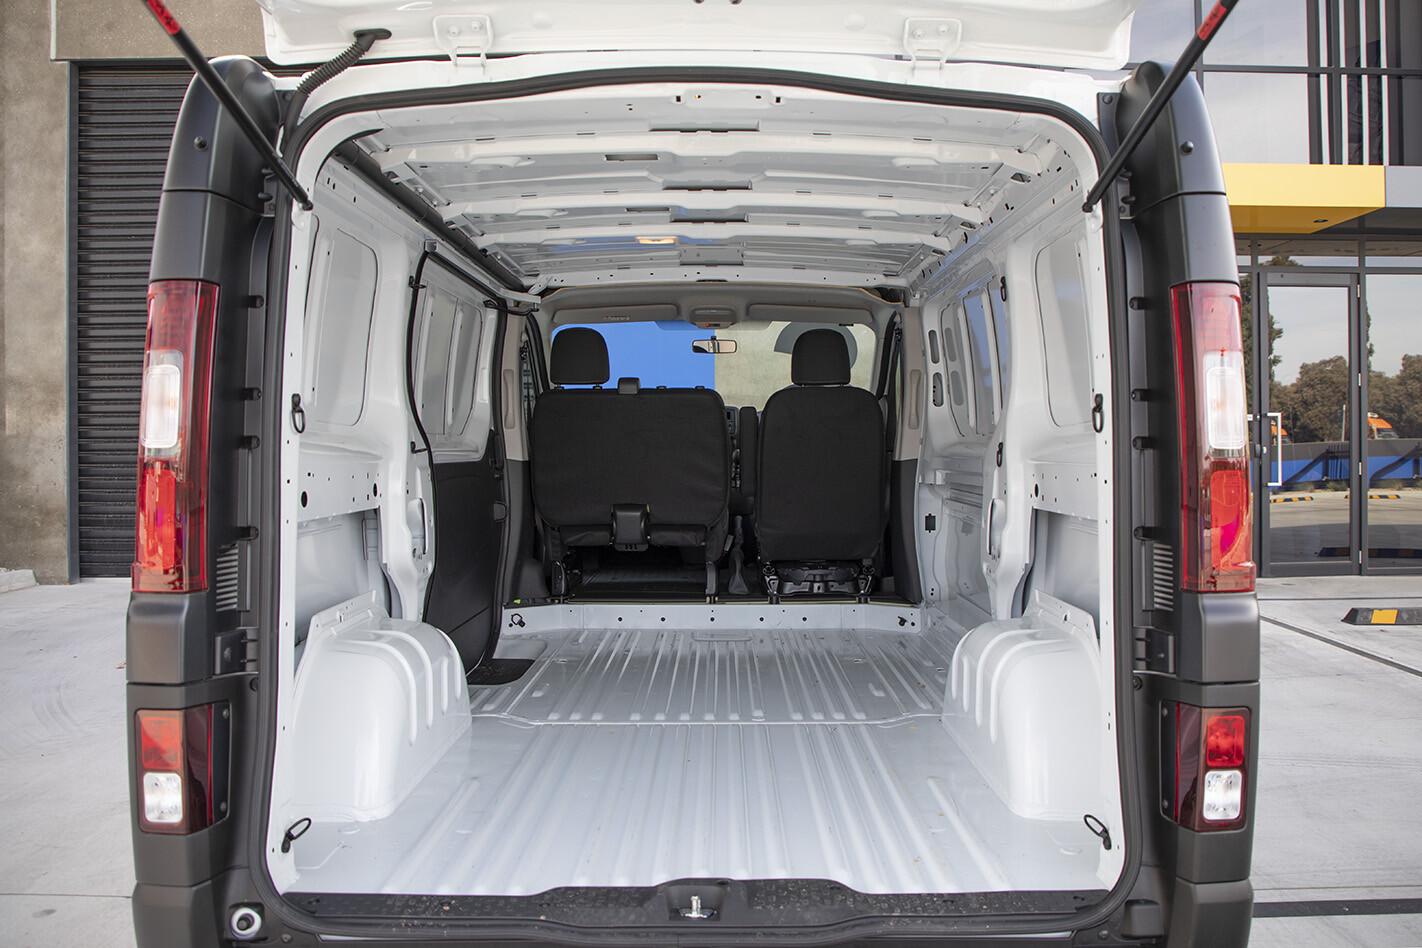 2019 Renault Trafic Traderlife Review Interior Reardoor Jpg